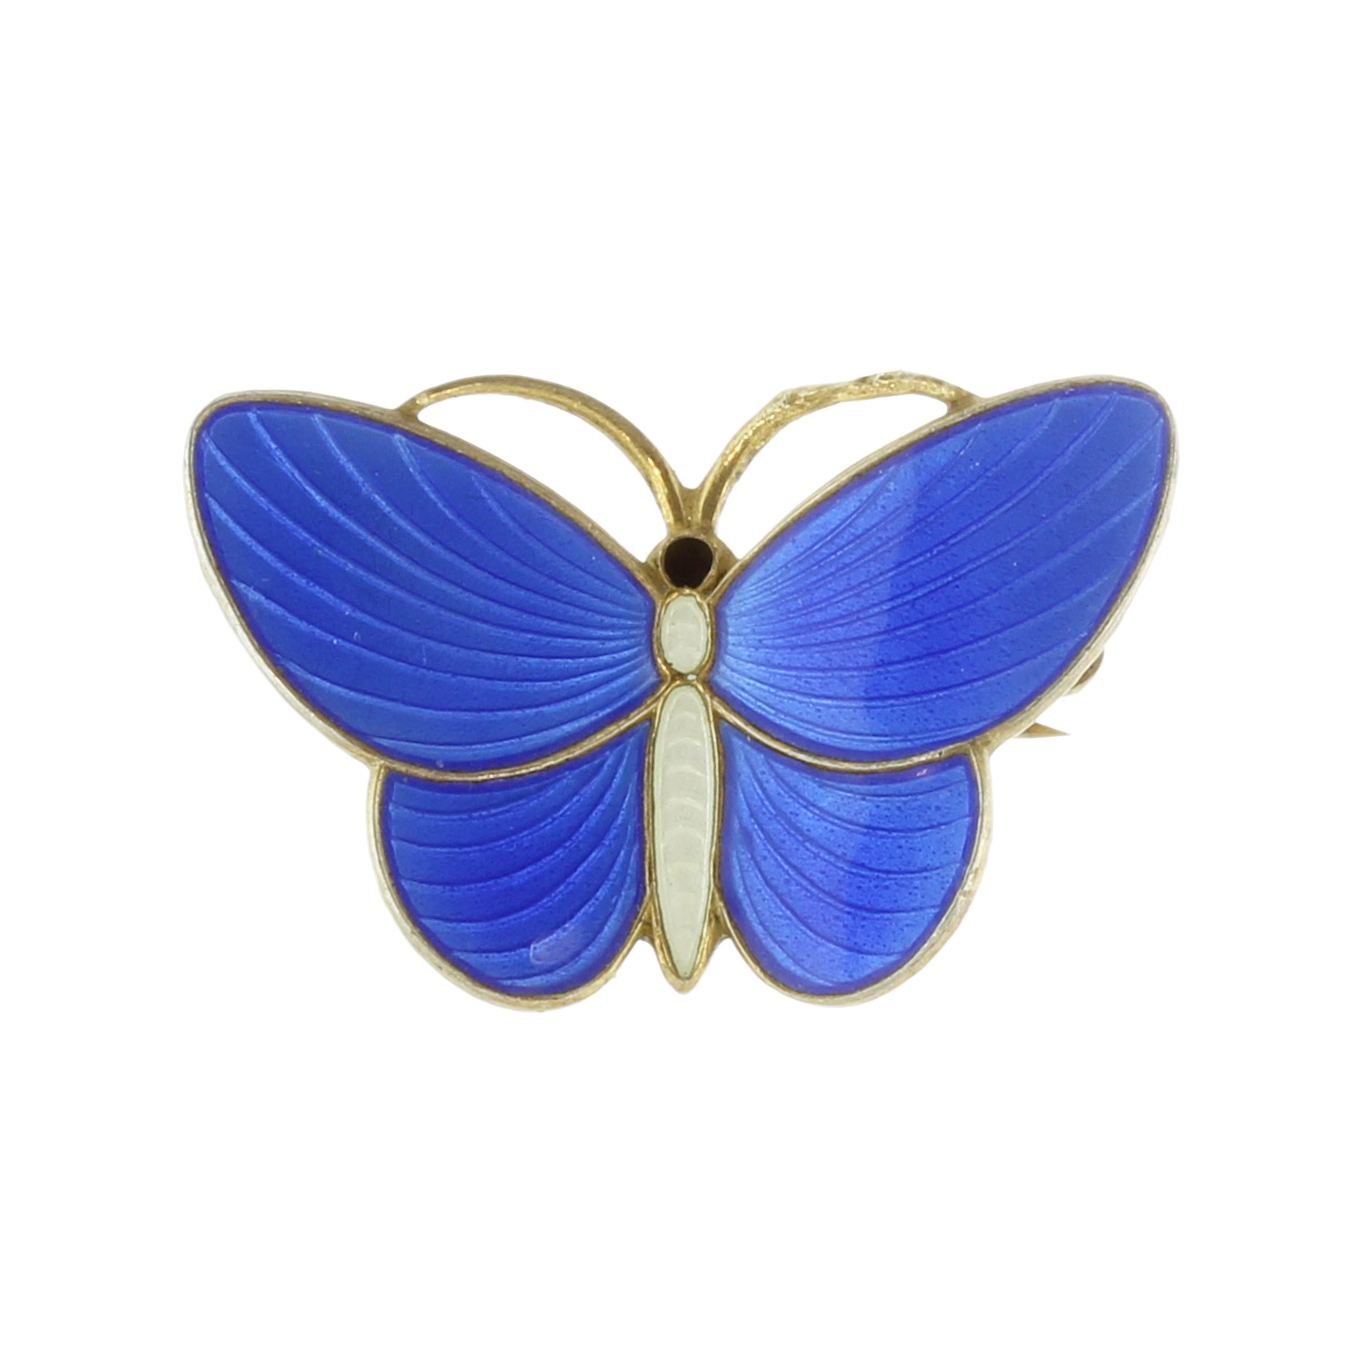 Los 11 - An antique Norwegian enamel butterfly brooch in sterling silver designed as a butterfly, with blue